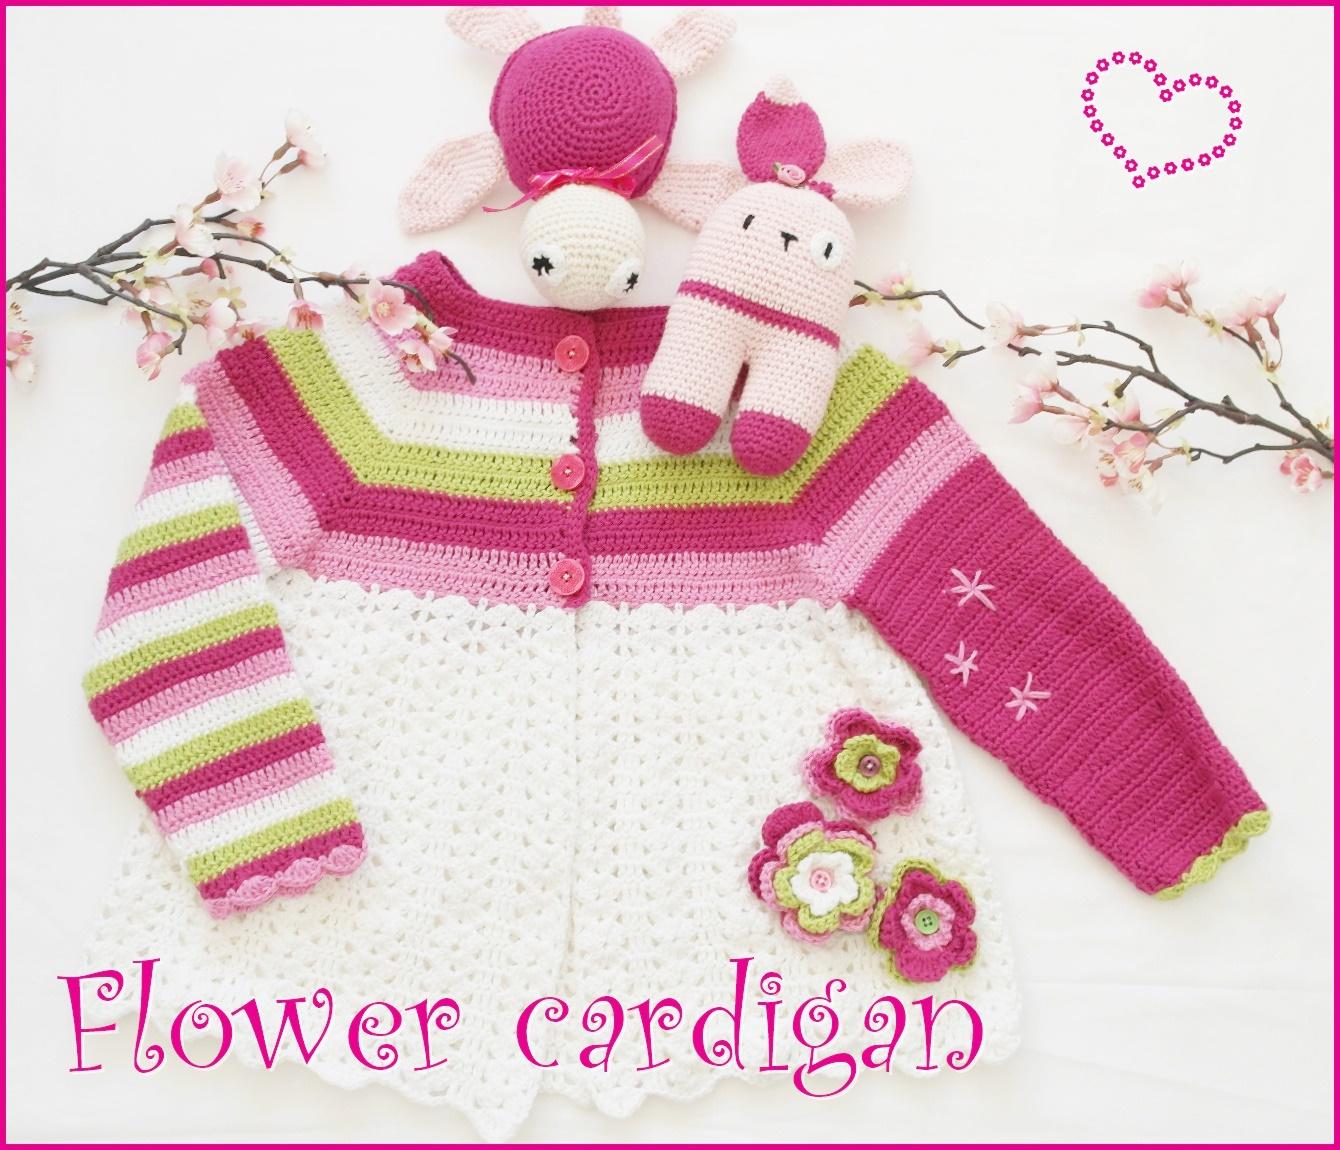 Flower cardigan